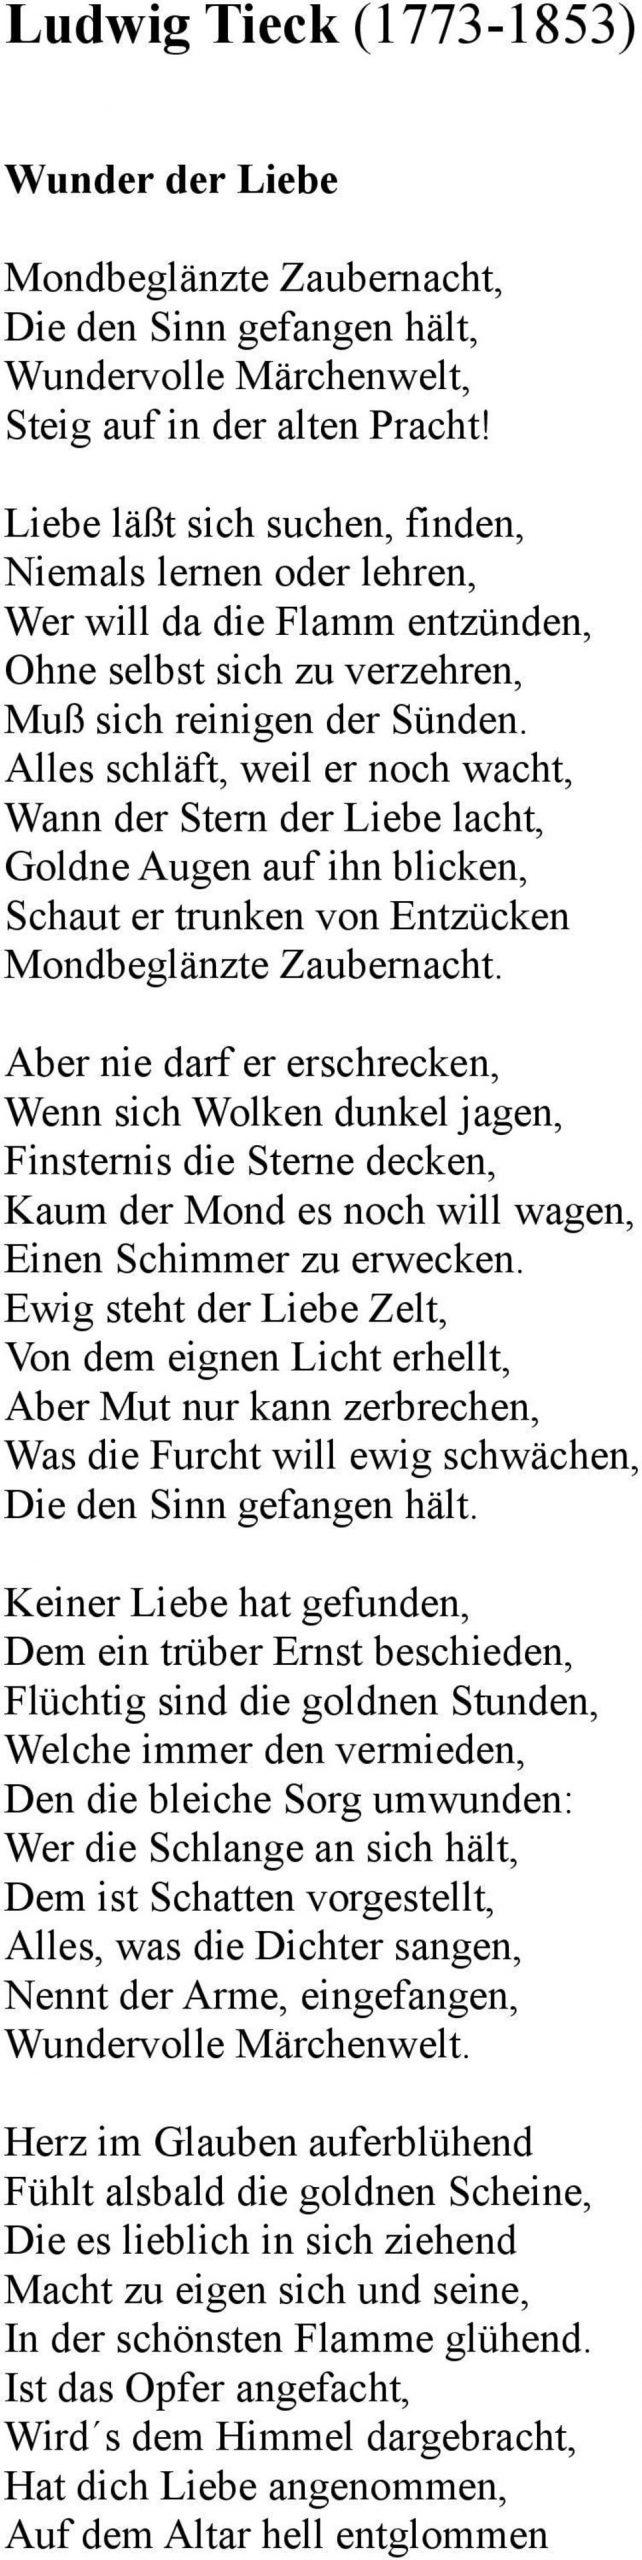 Romantiek ( ): Extra Gedichten - Pdf Free Download innen Mondbeglänzte Zaubernacht Die Den Sinn Gefangen Hält